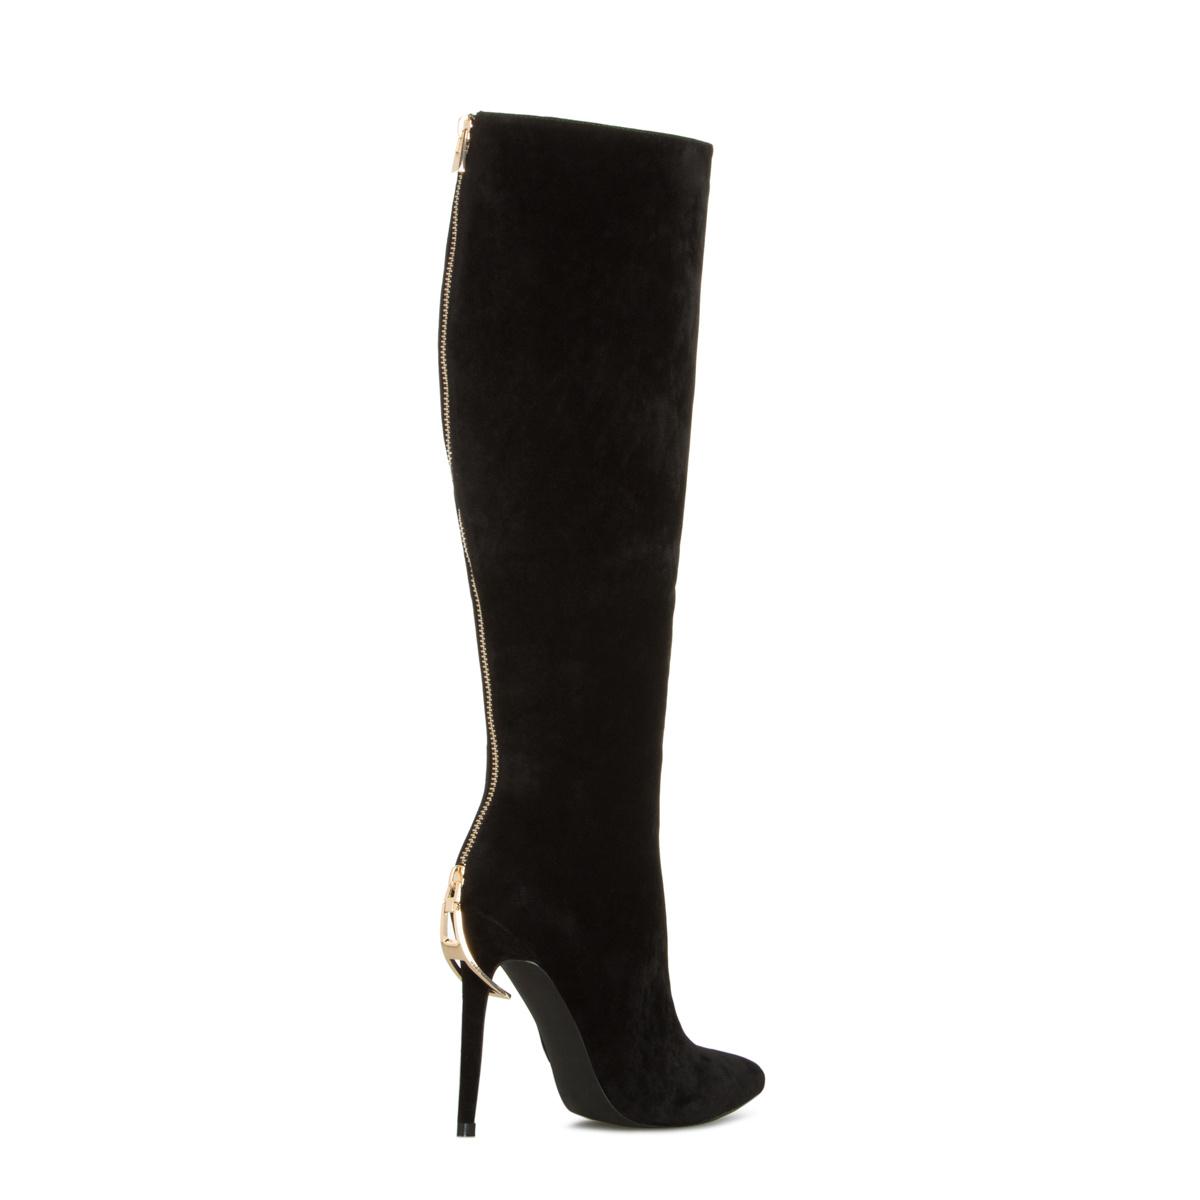 Sexy Black High Heel Boots